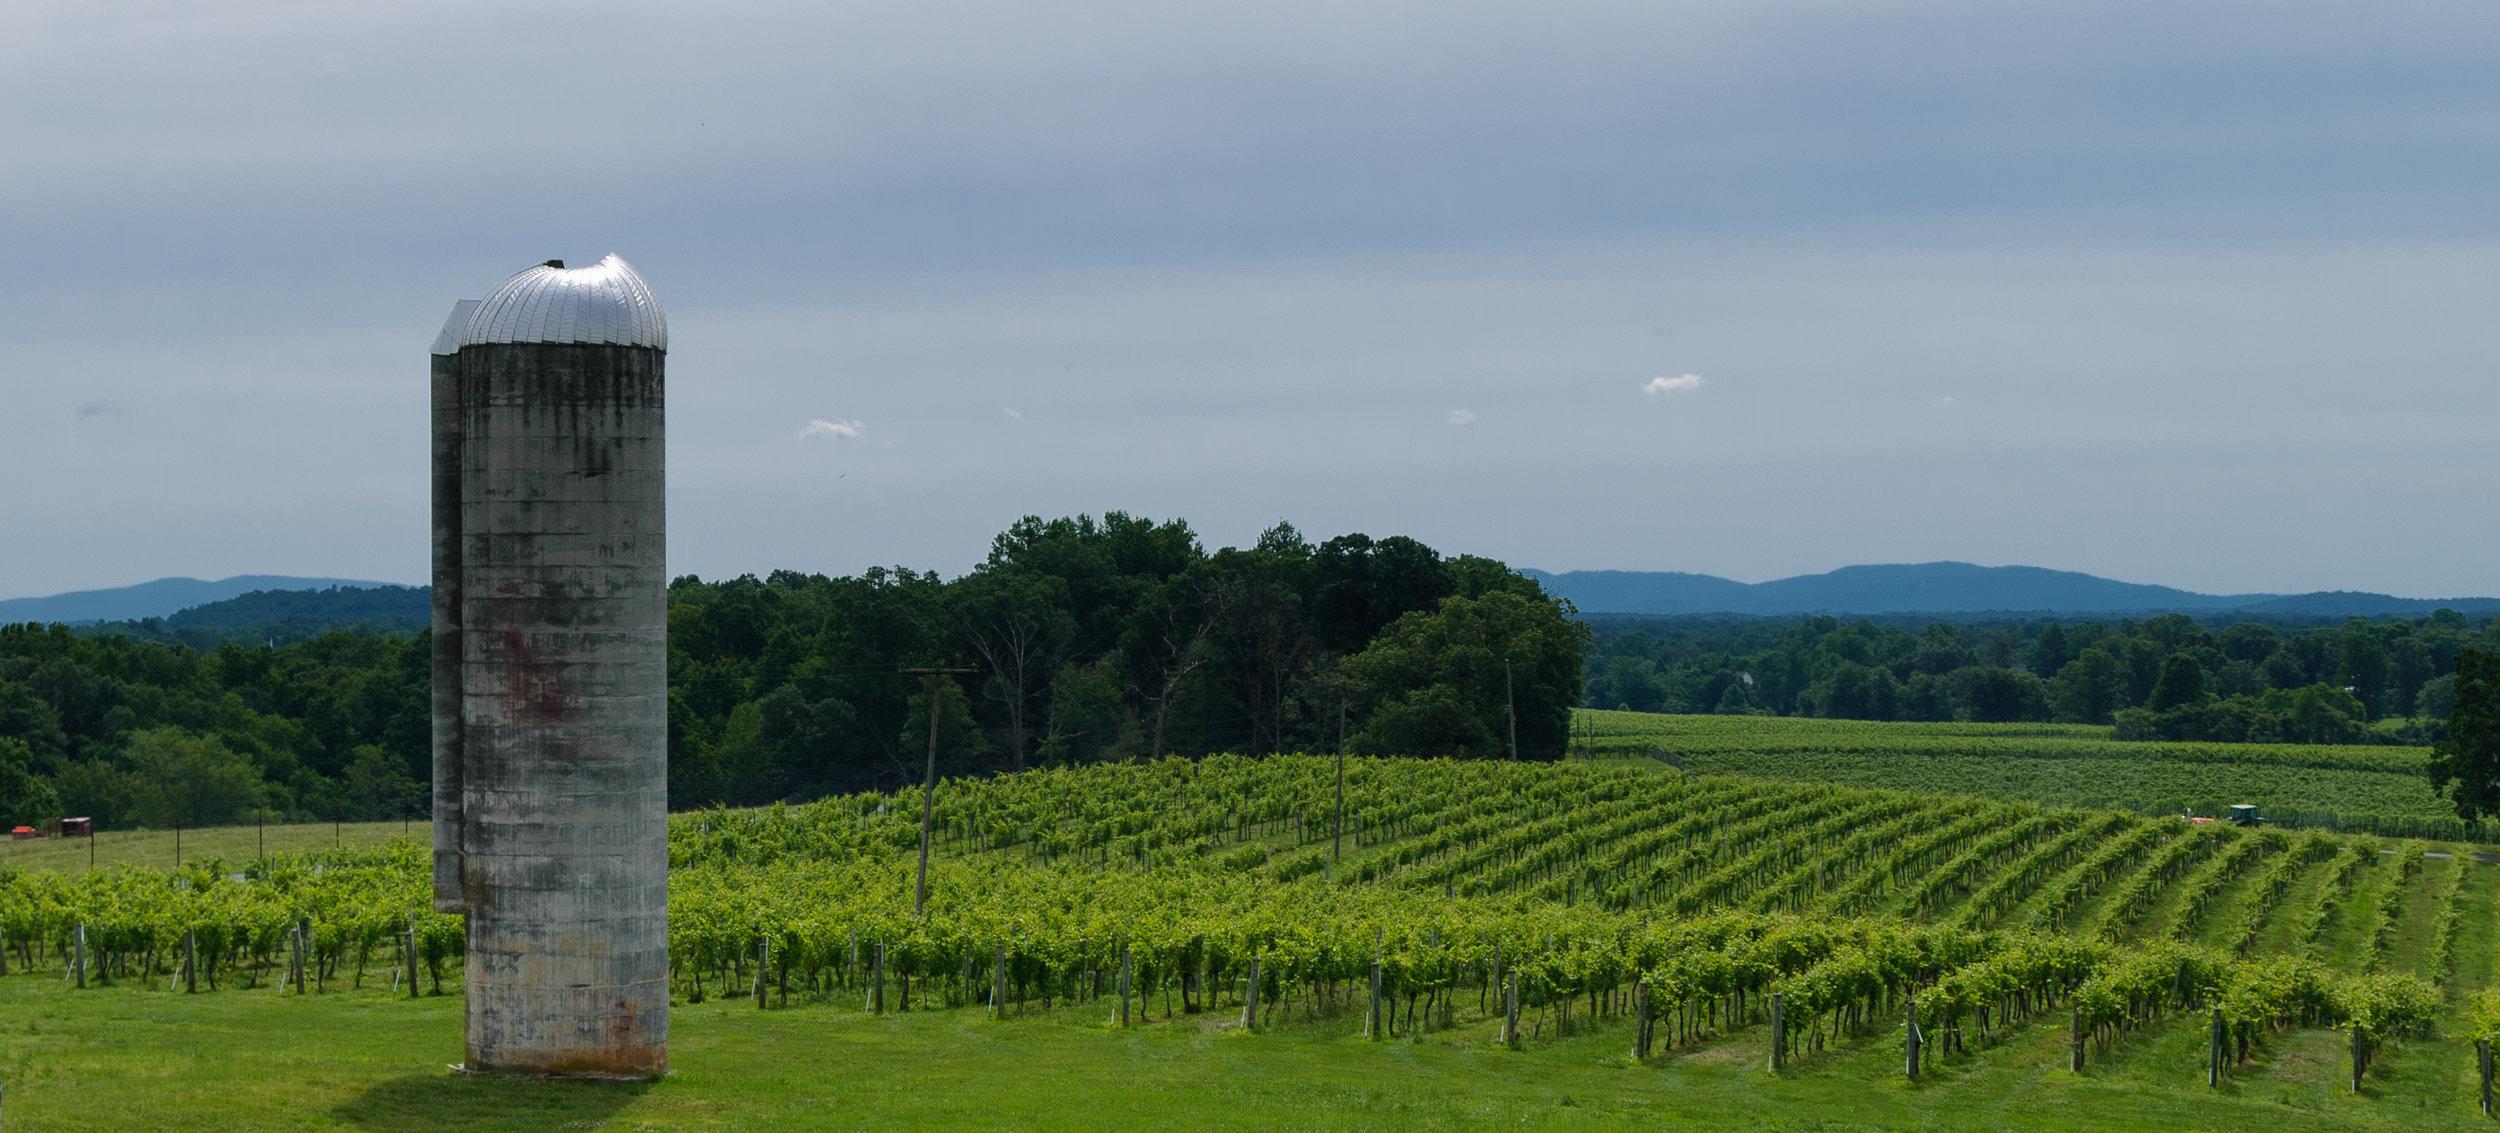 grace-estate-winery-charlottesville-va.jpg